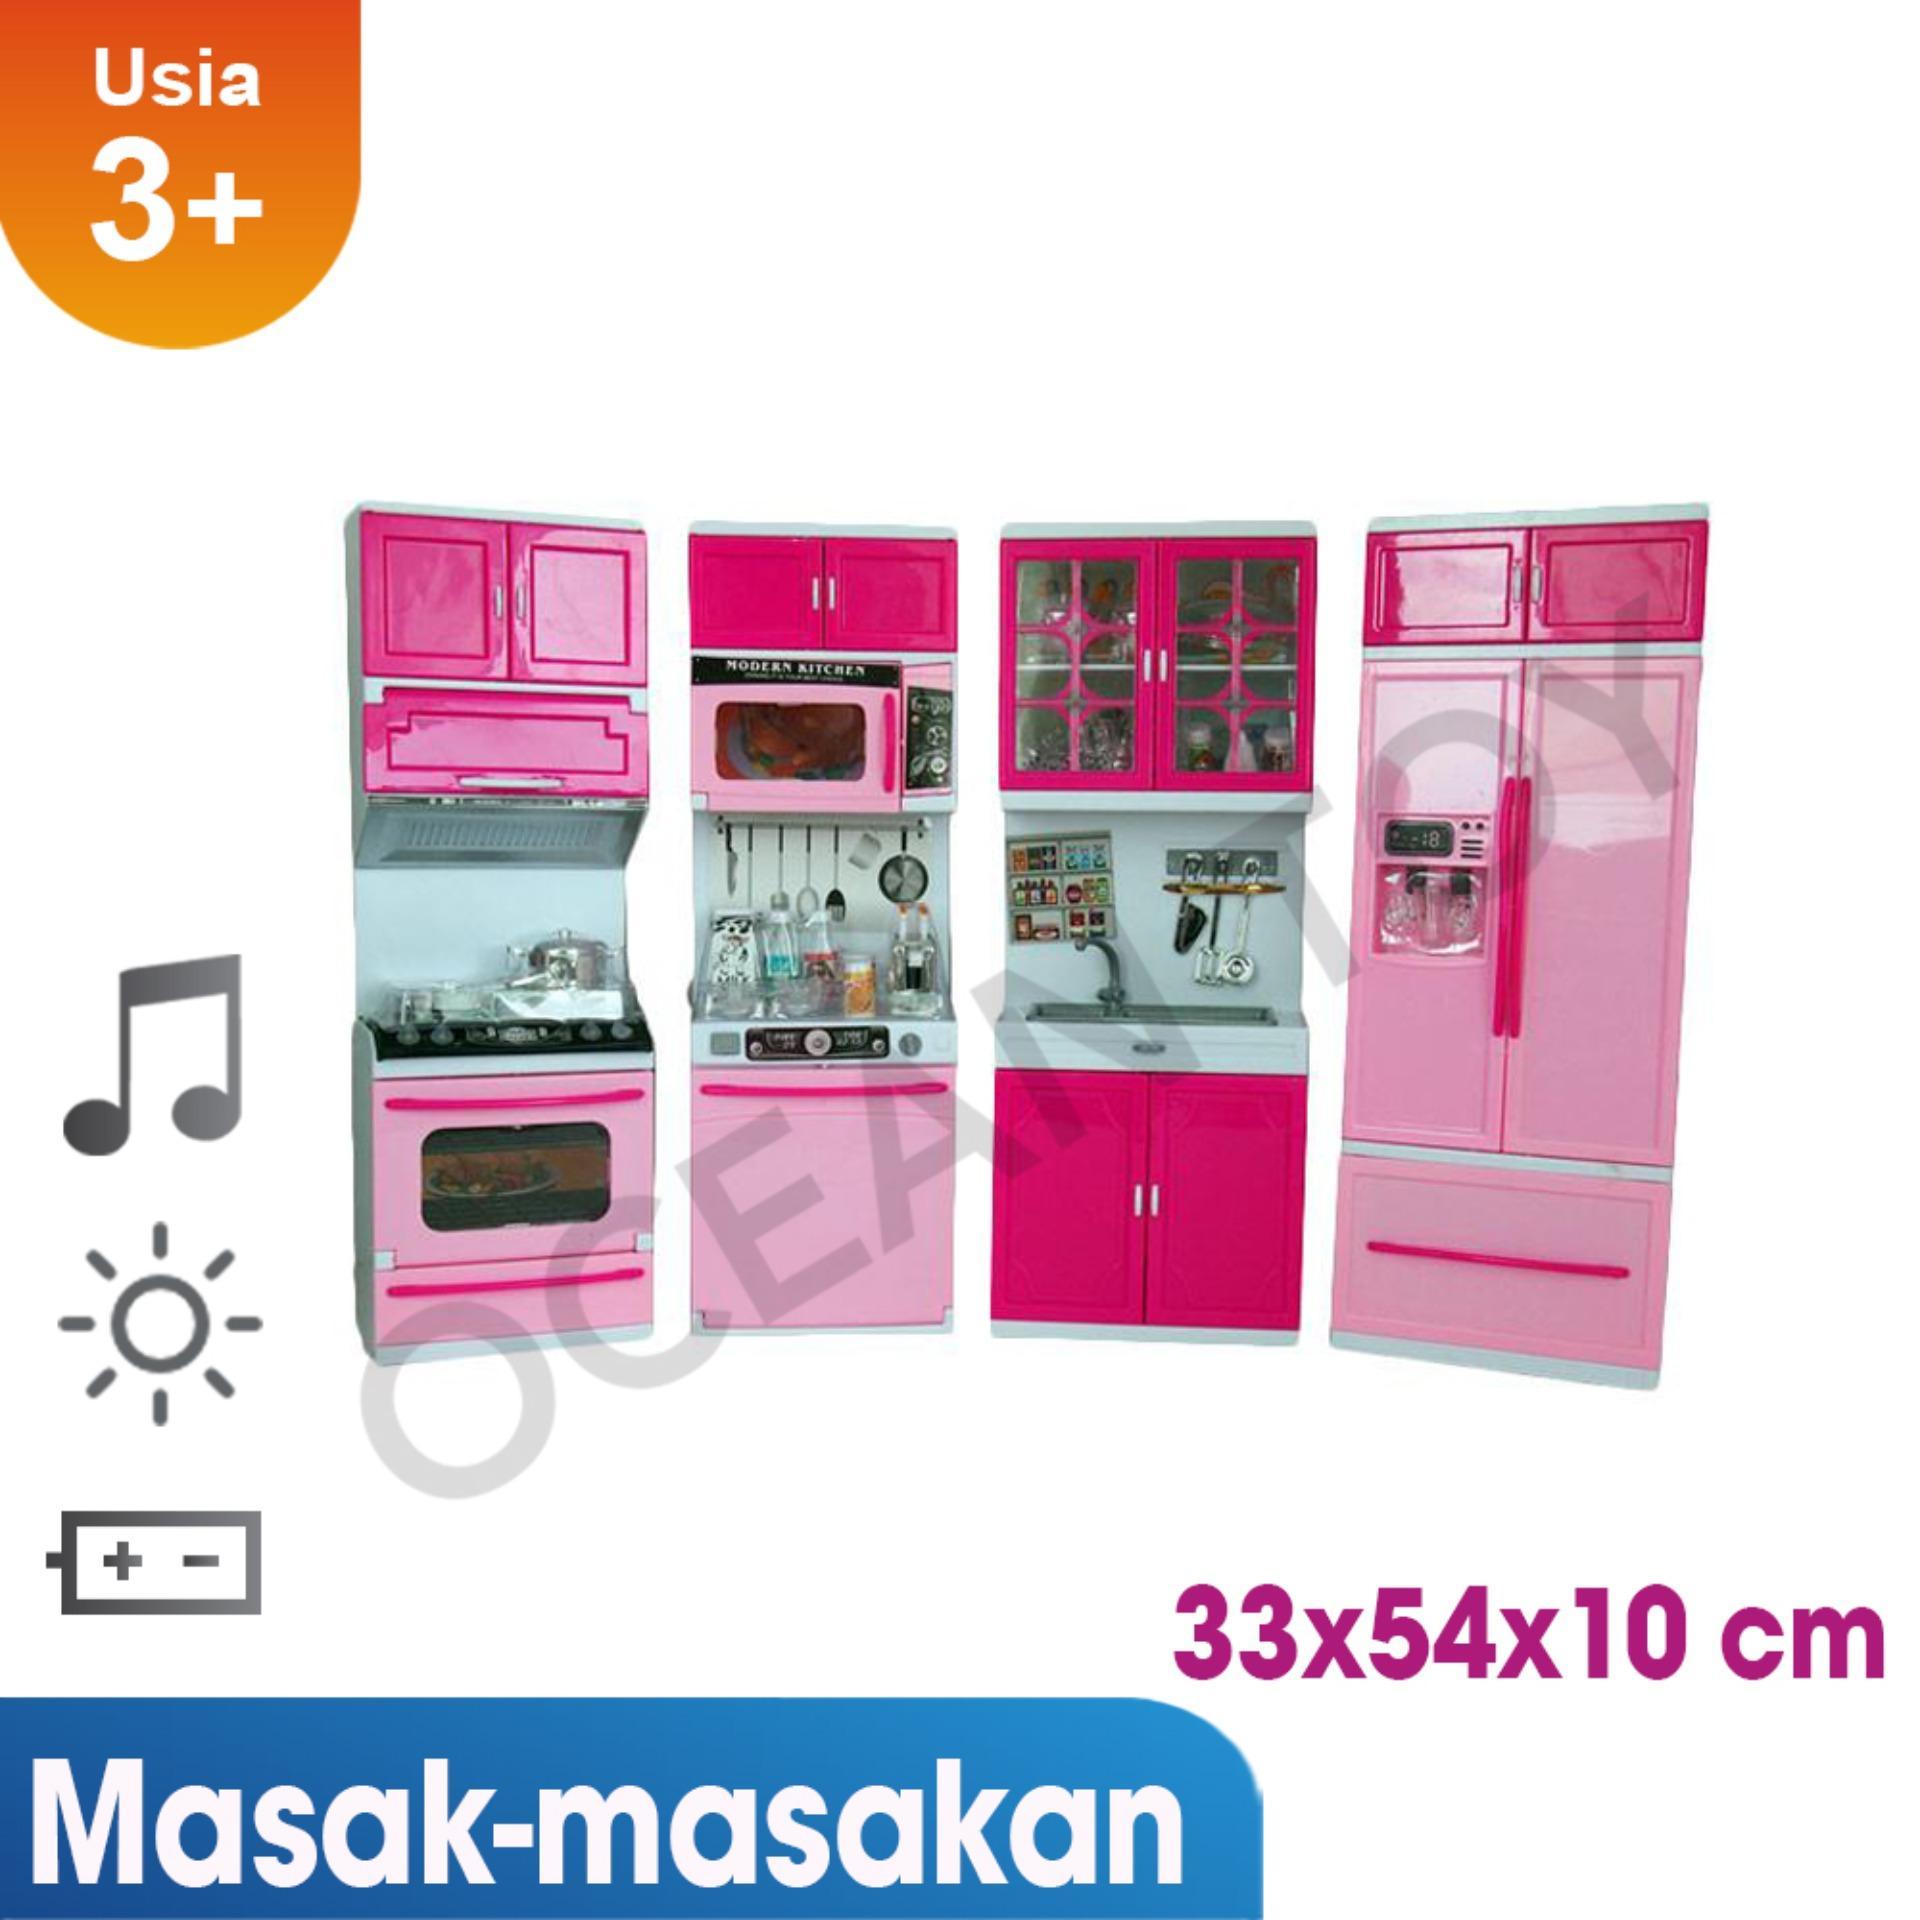 Ocean Toy Modern Kitchen Set Besar Mainan Anak 818-30 Pink